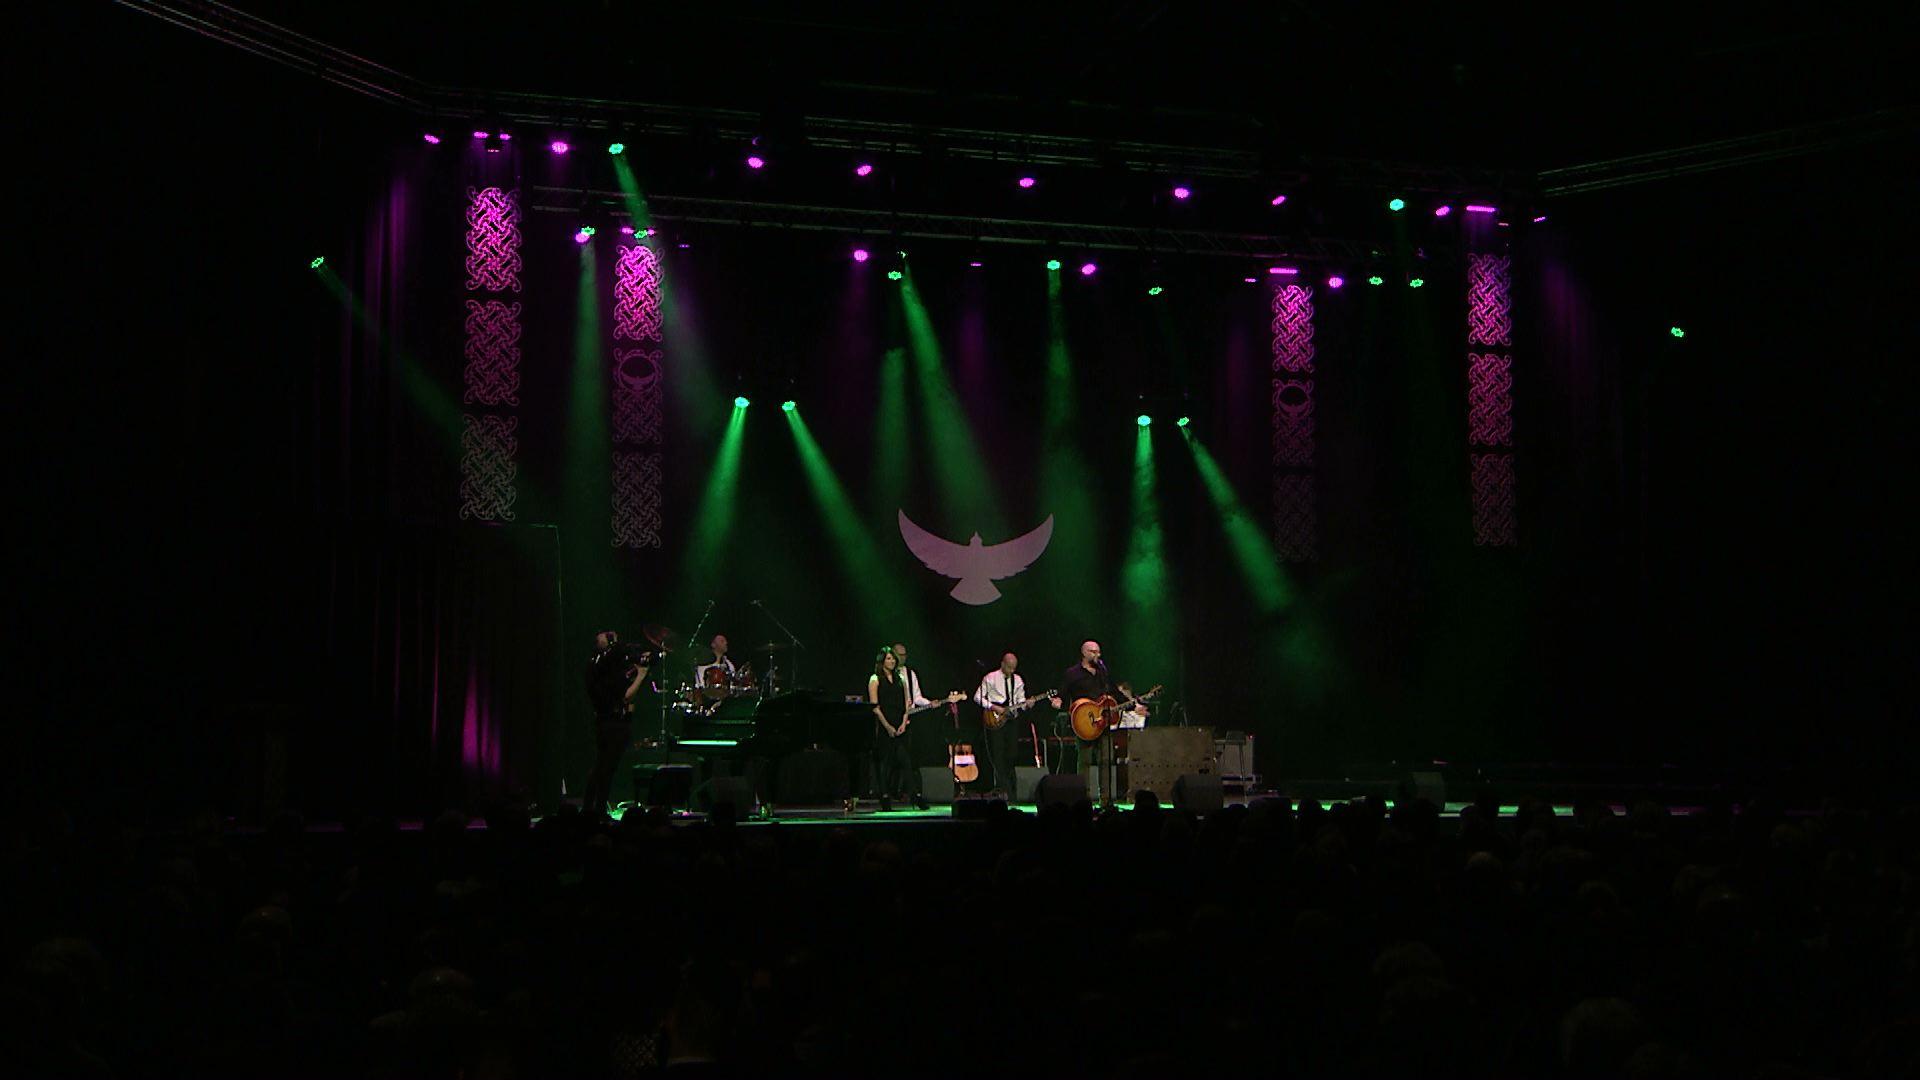 Live stream Zilveren Duif awards 2015